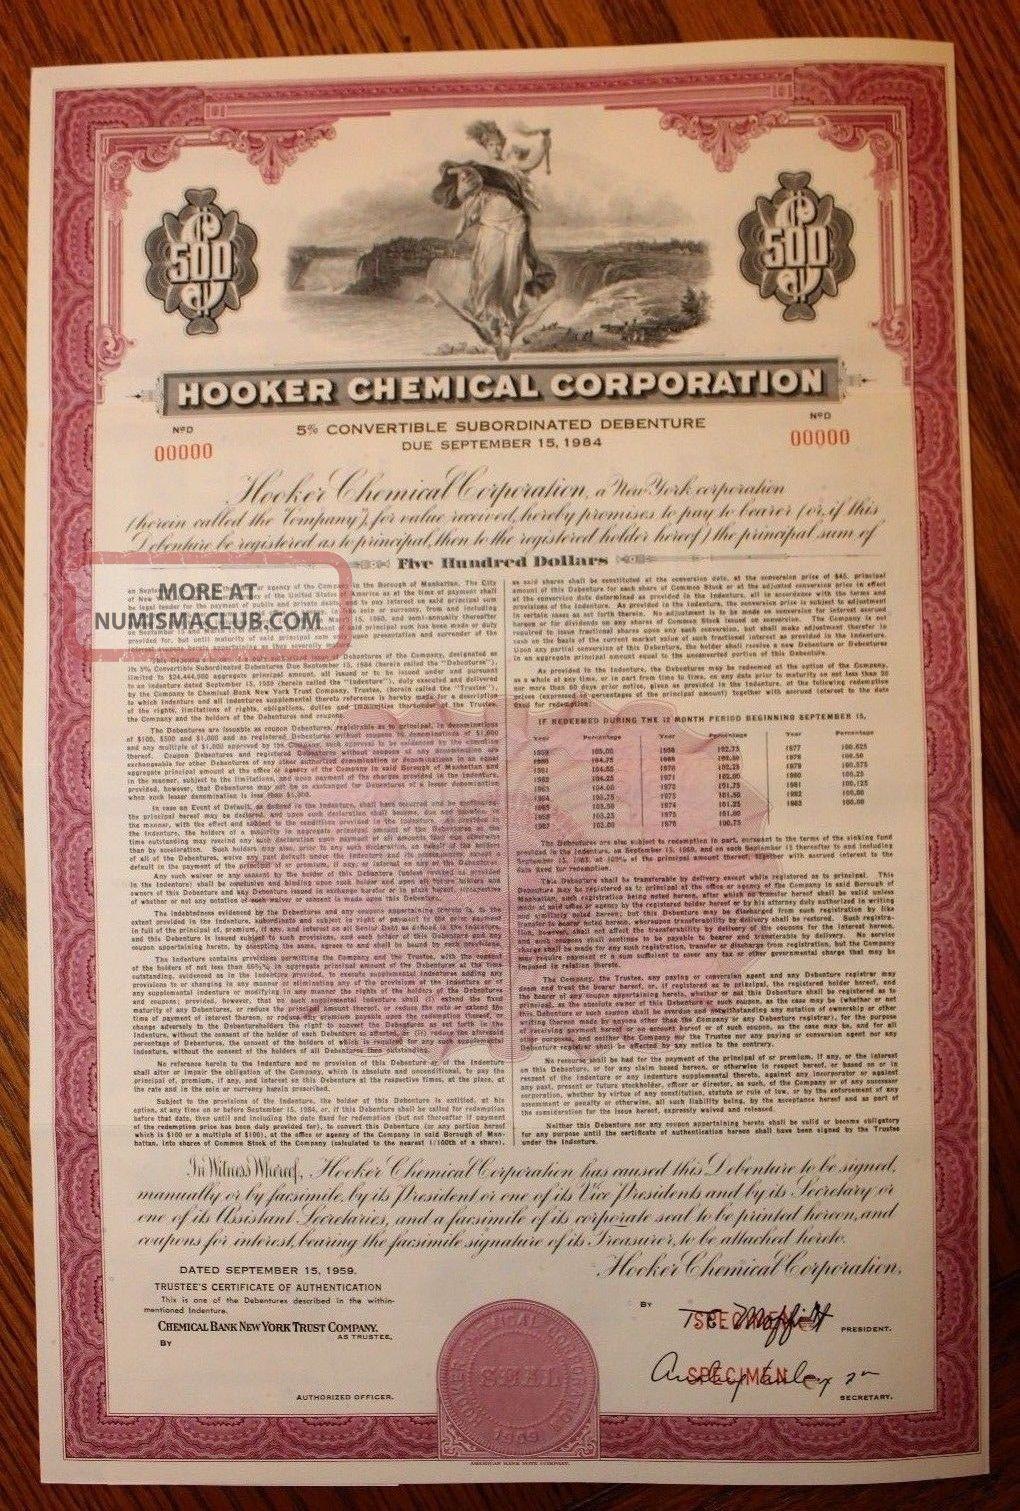 1959 Hooker Chemical Specimen $500 Bond Love Canal Disaster,  Niagara Falls Rare Stocks & Bonds, Scripophily photo